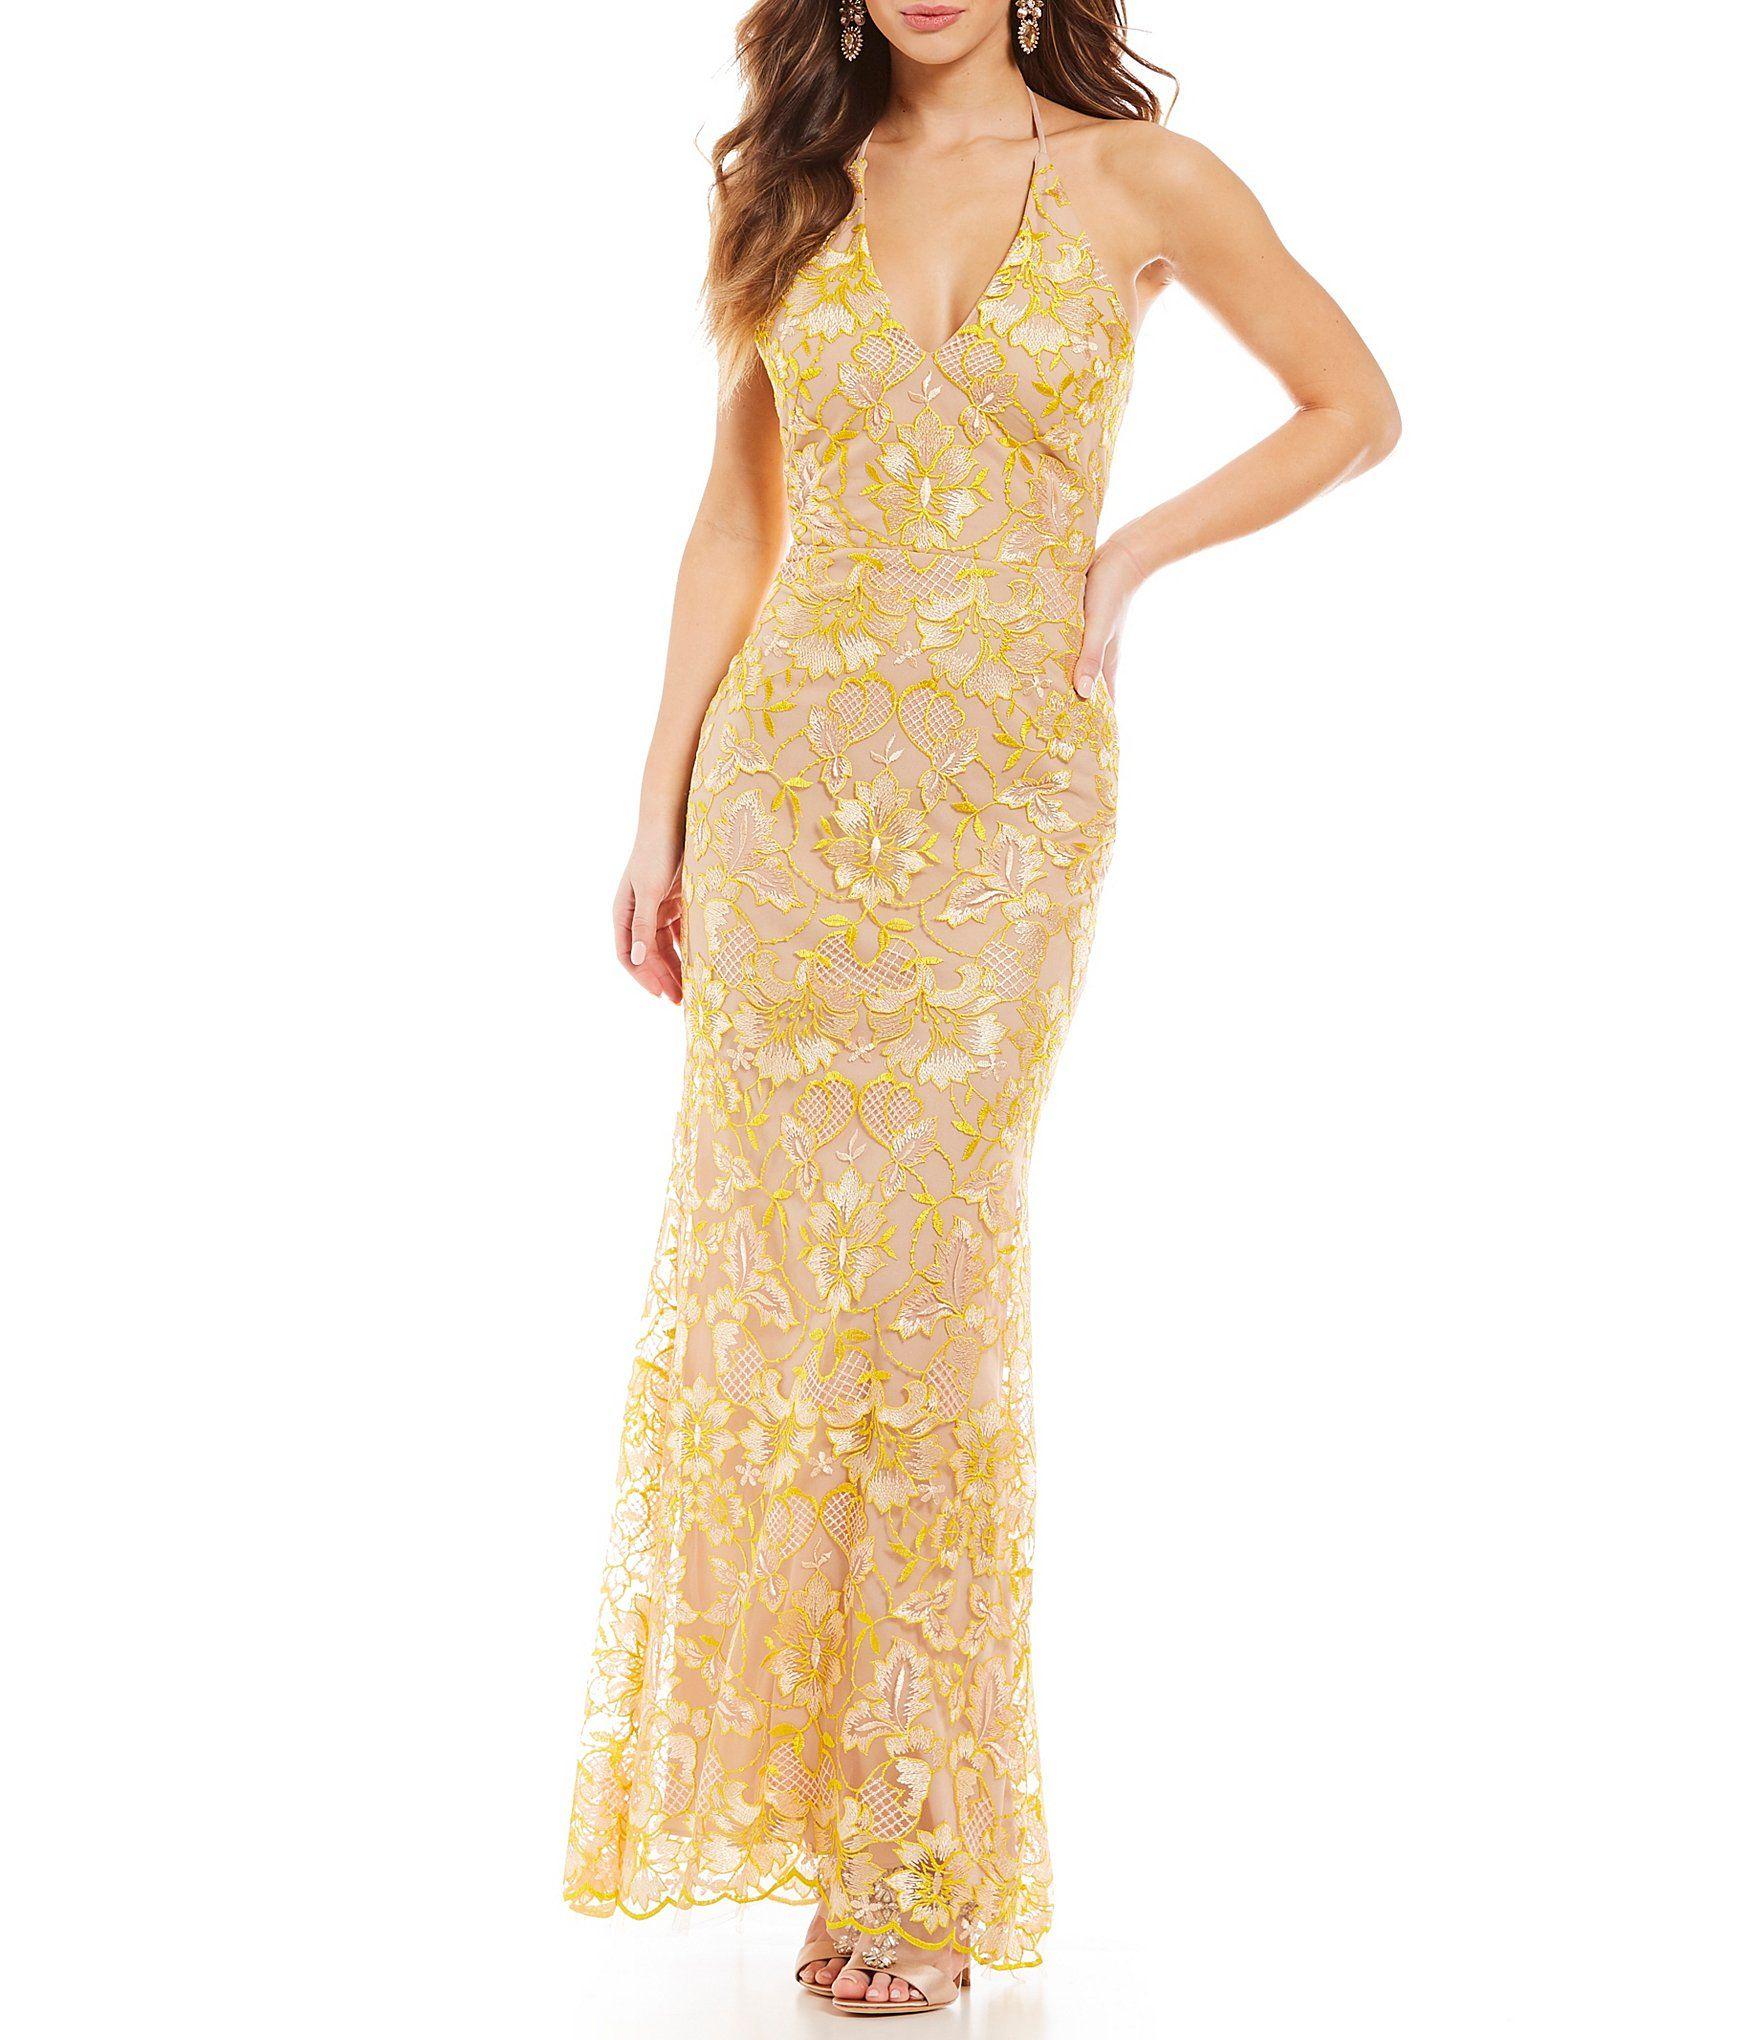 Gb social halter neck floral lace gown pinterest halter neck